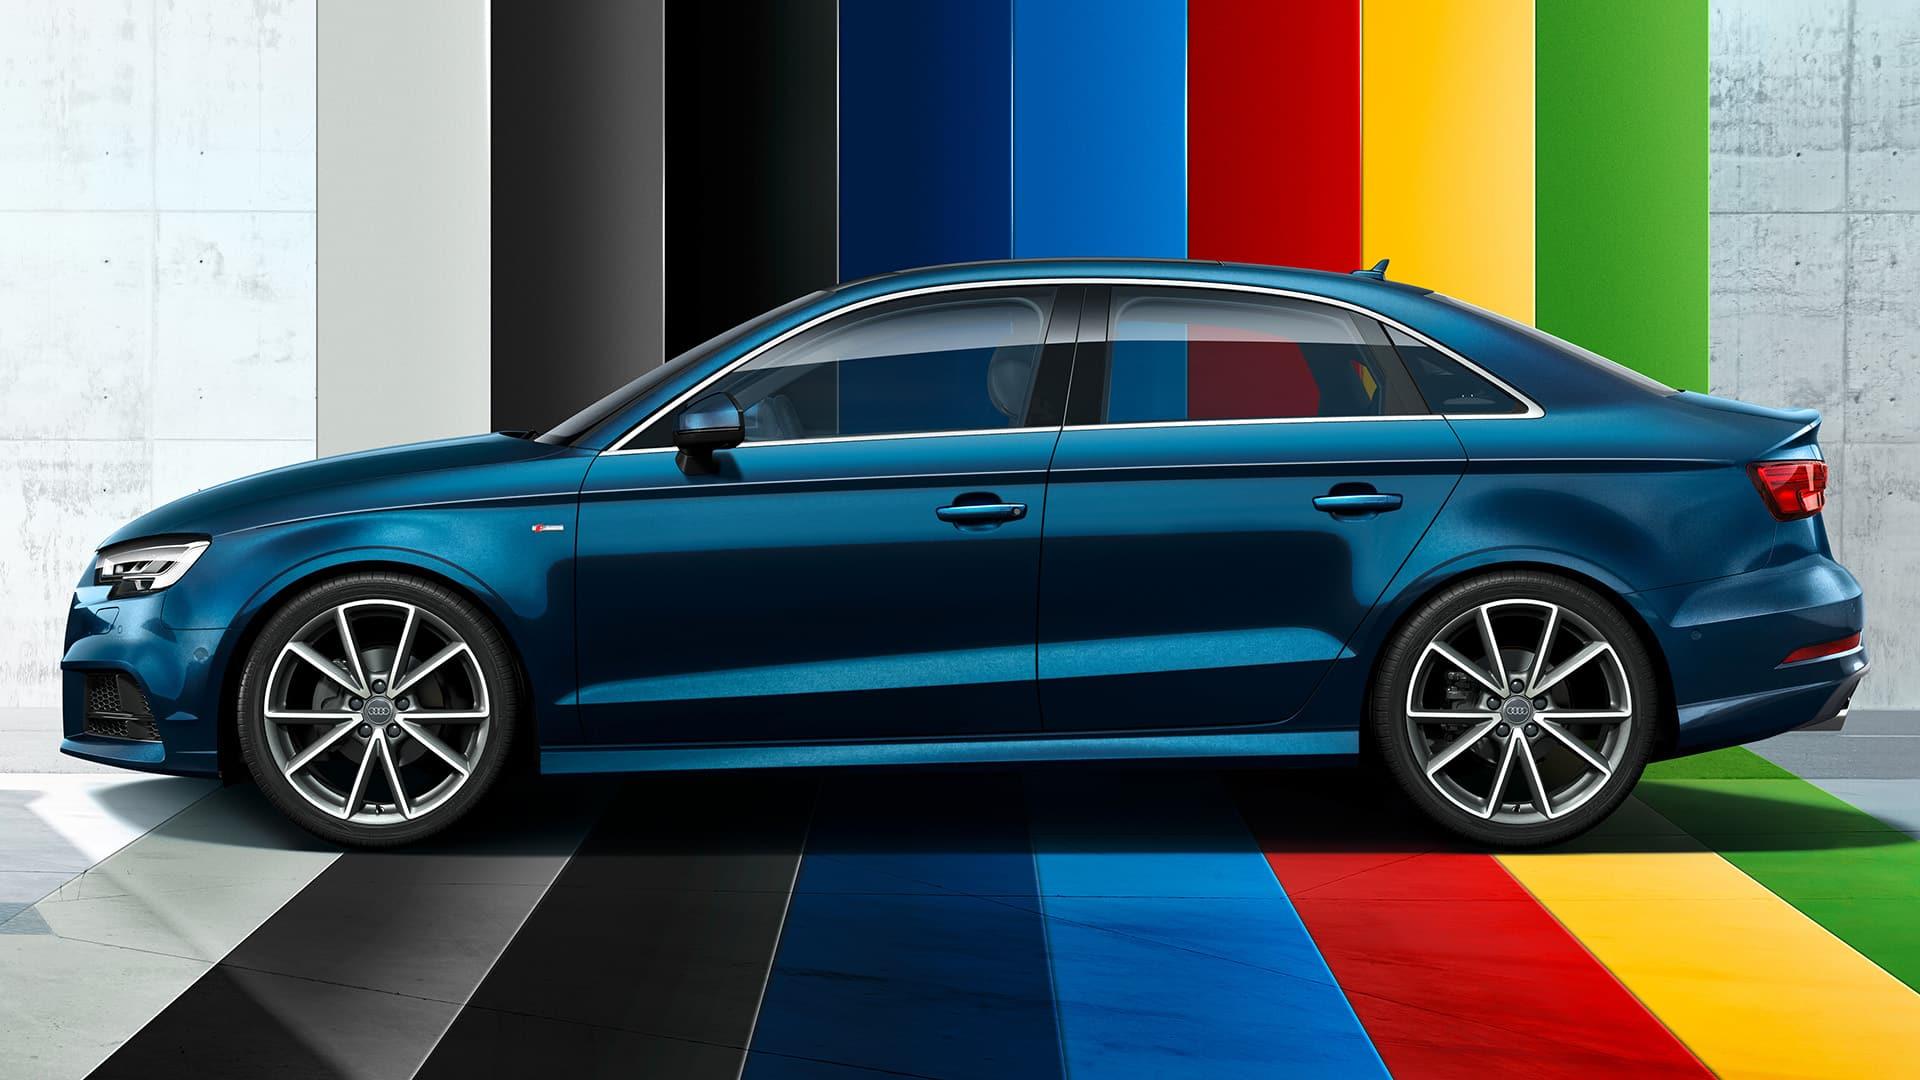 Audi A3 Dimensions >> A3 Sedan > A3 > Audi India